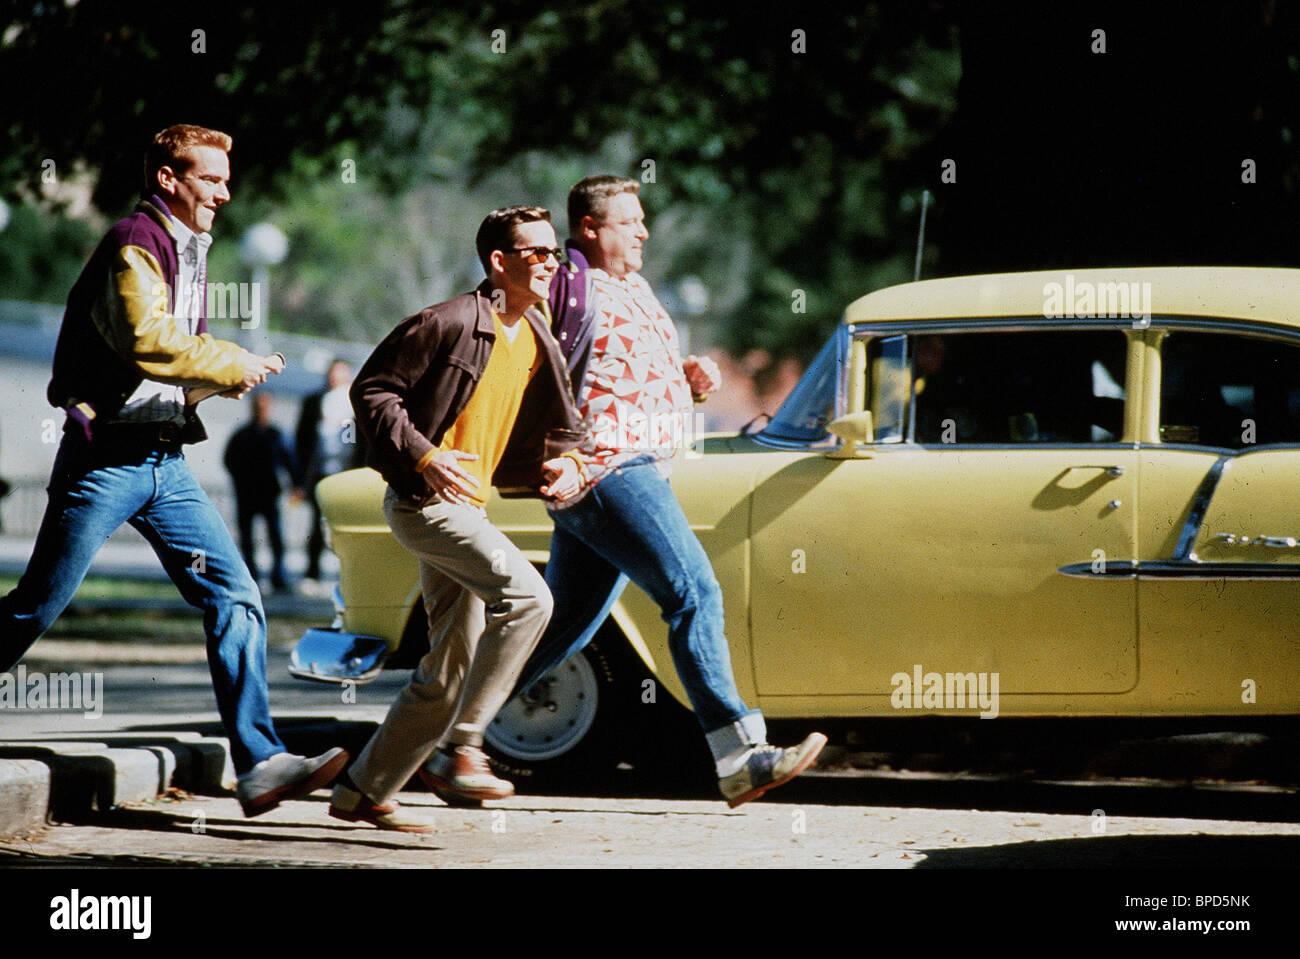 DENNIS QUAID TIMOTHY HUTTON JOHN GOODMAN EVERYBODYS ALL AMERICAN 1988